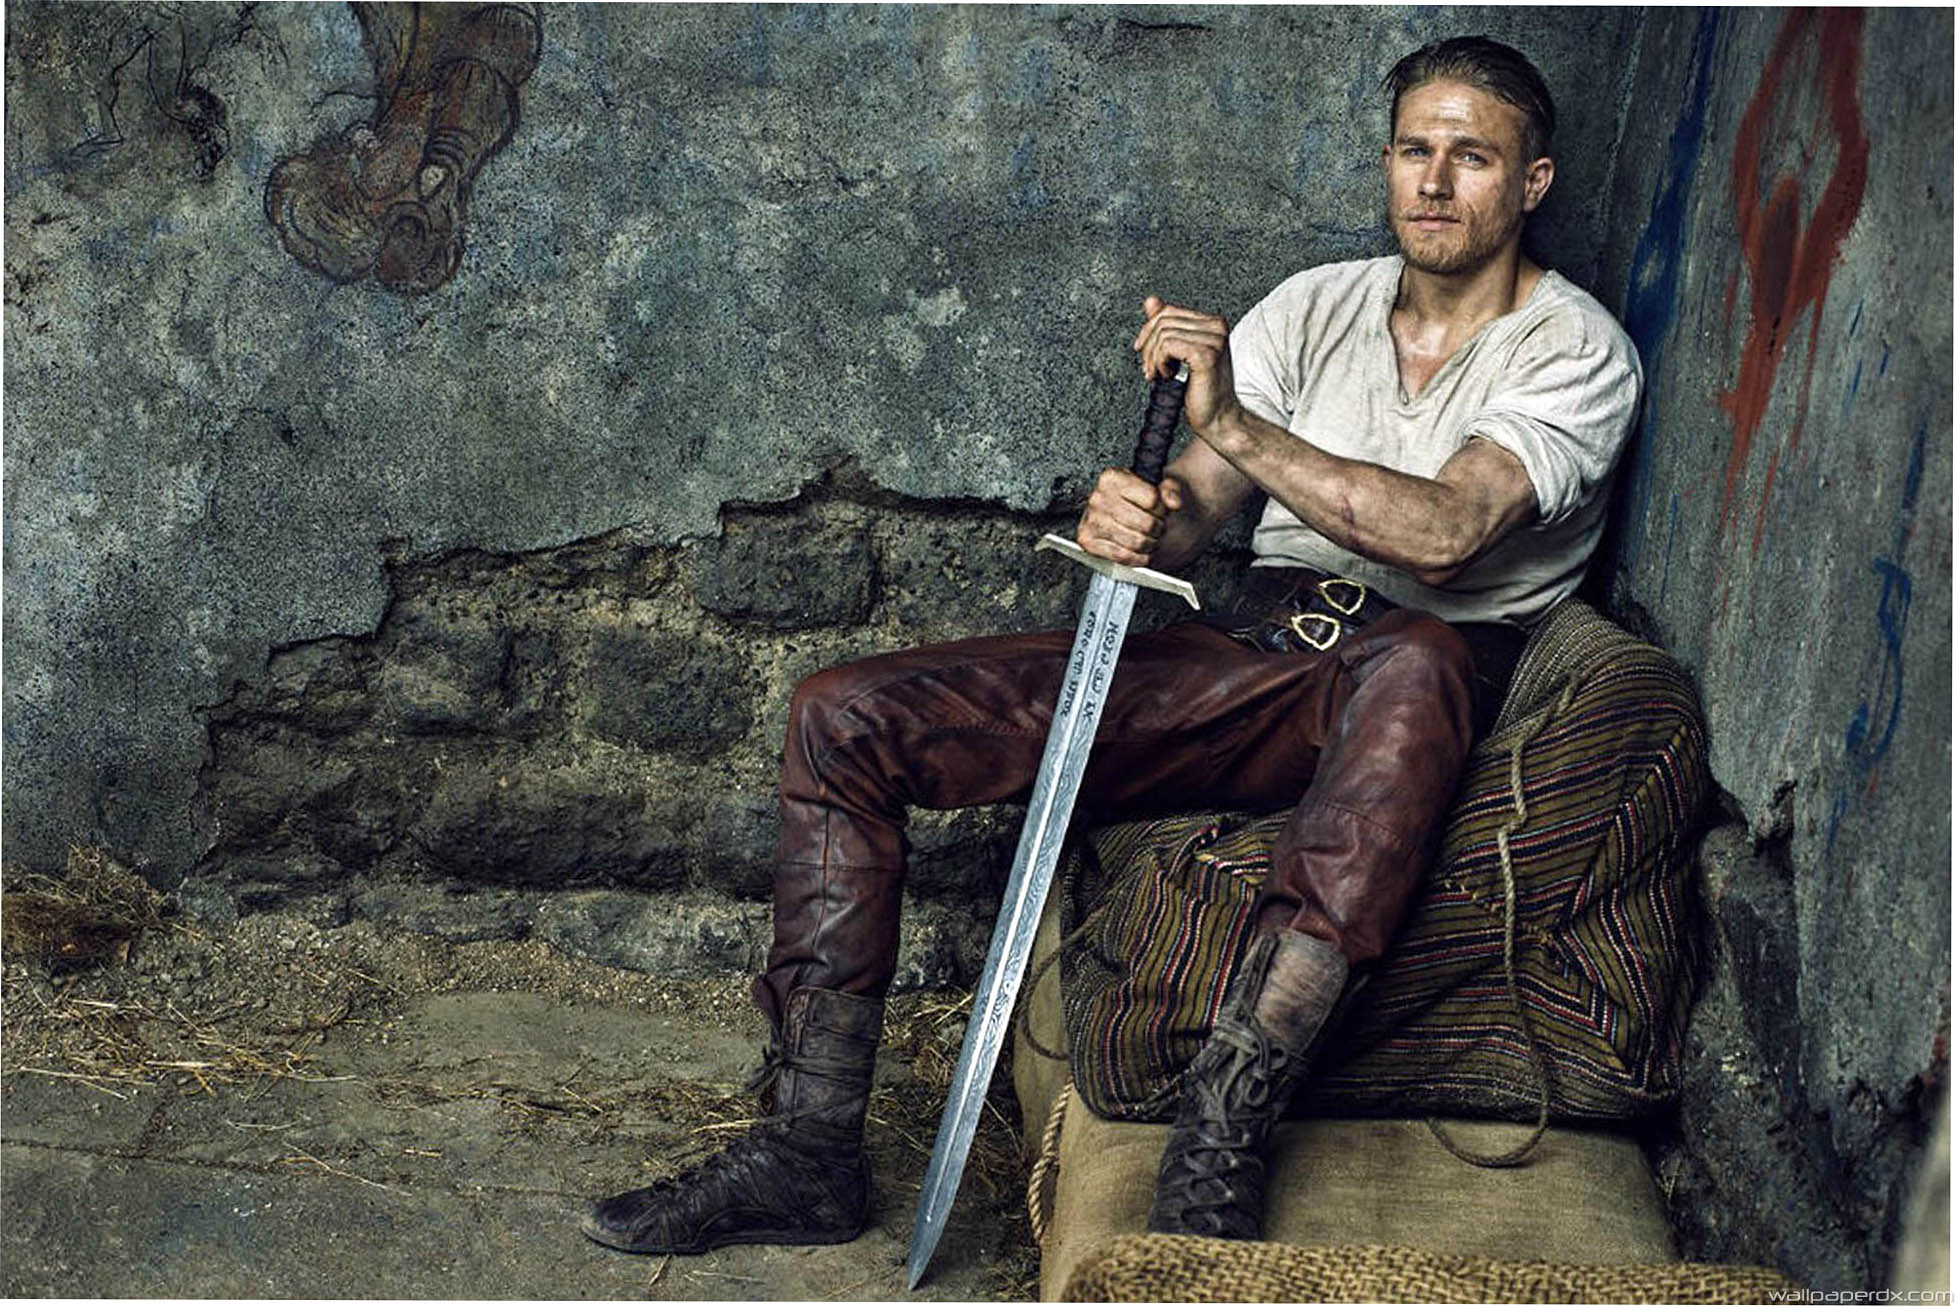 Charlie Hunnam as Arthur in King Arthur: Legend of the Sword (2017)